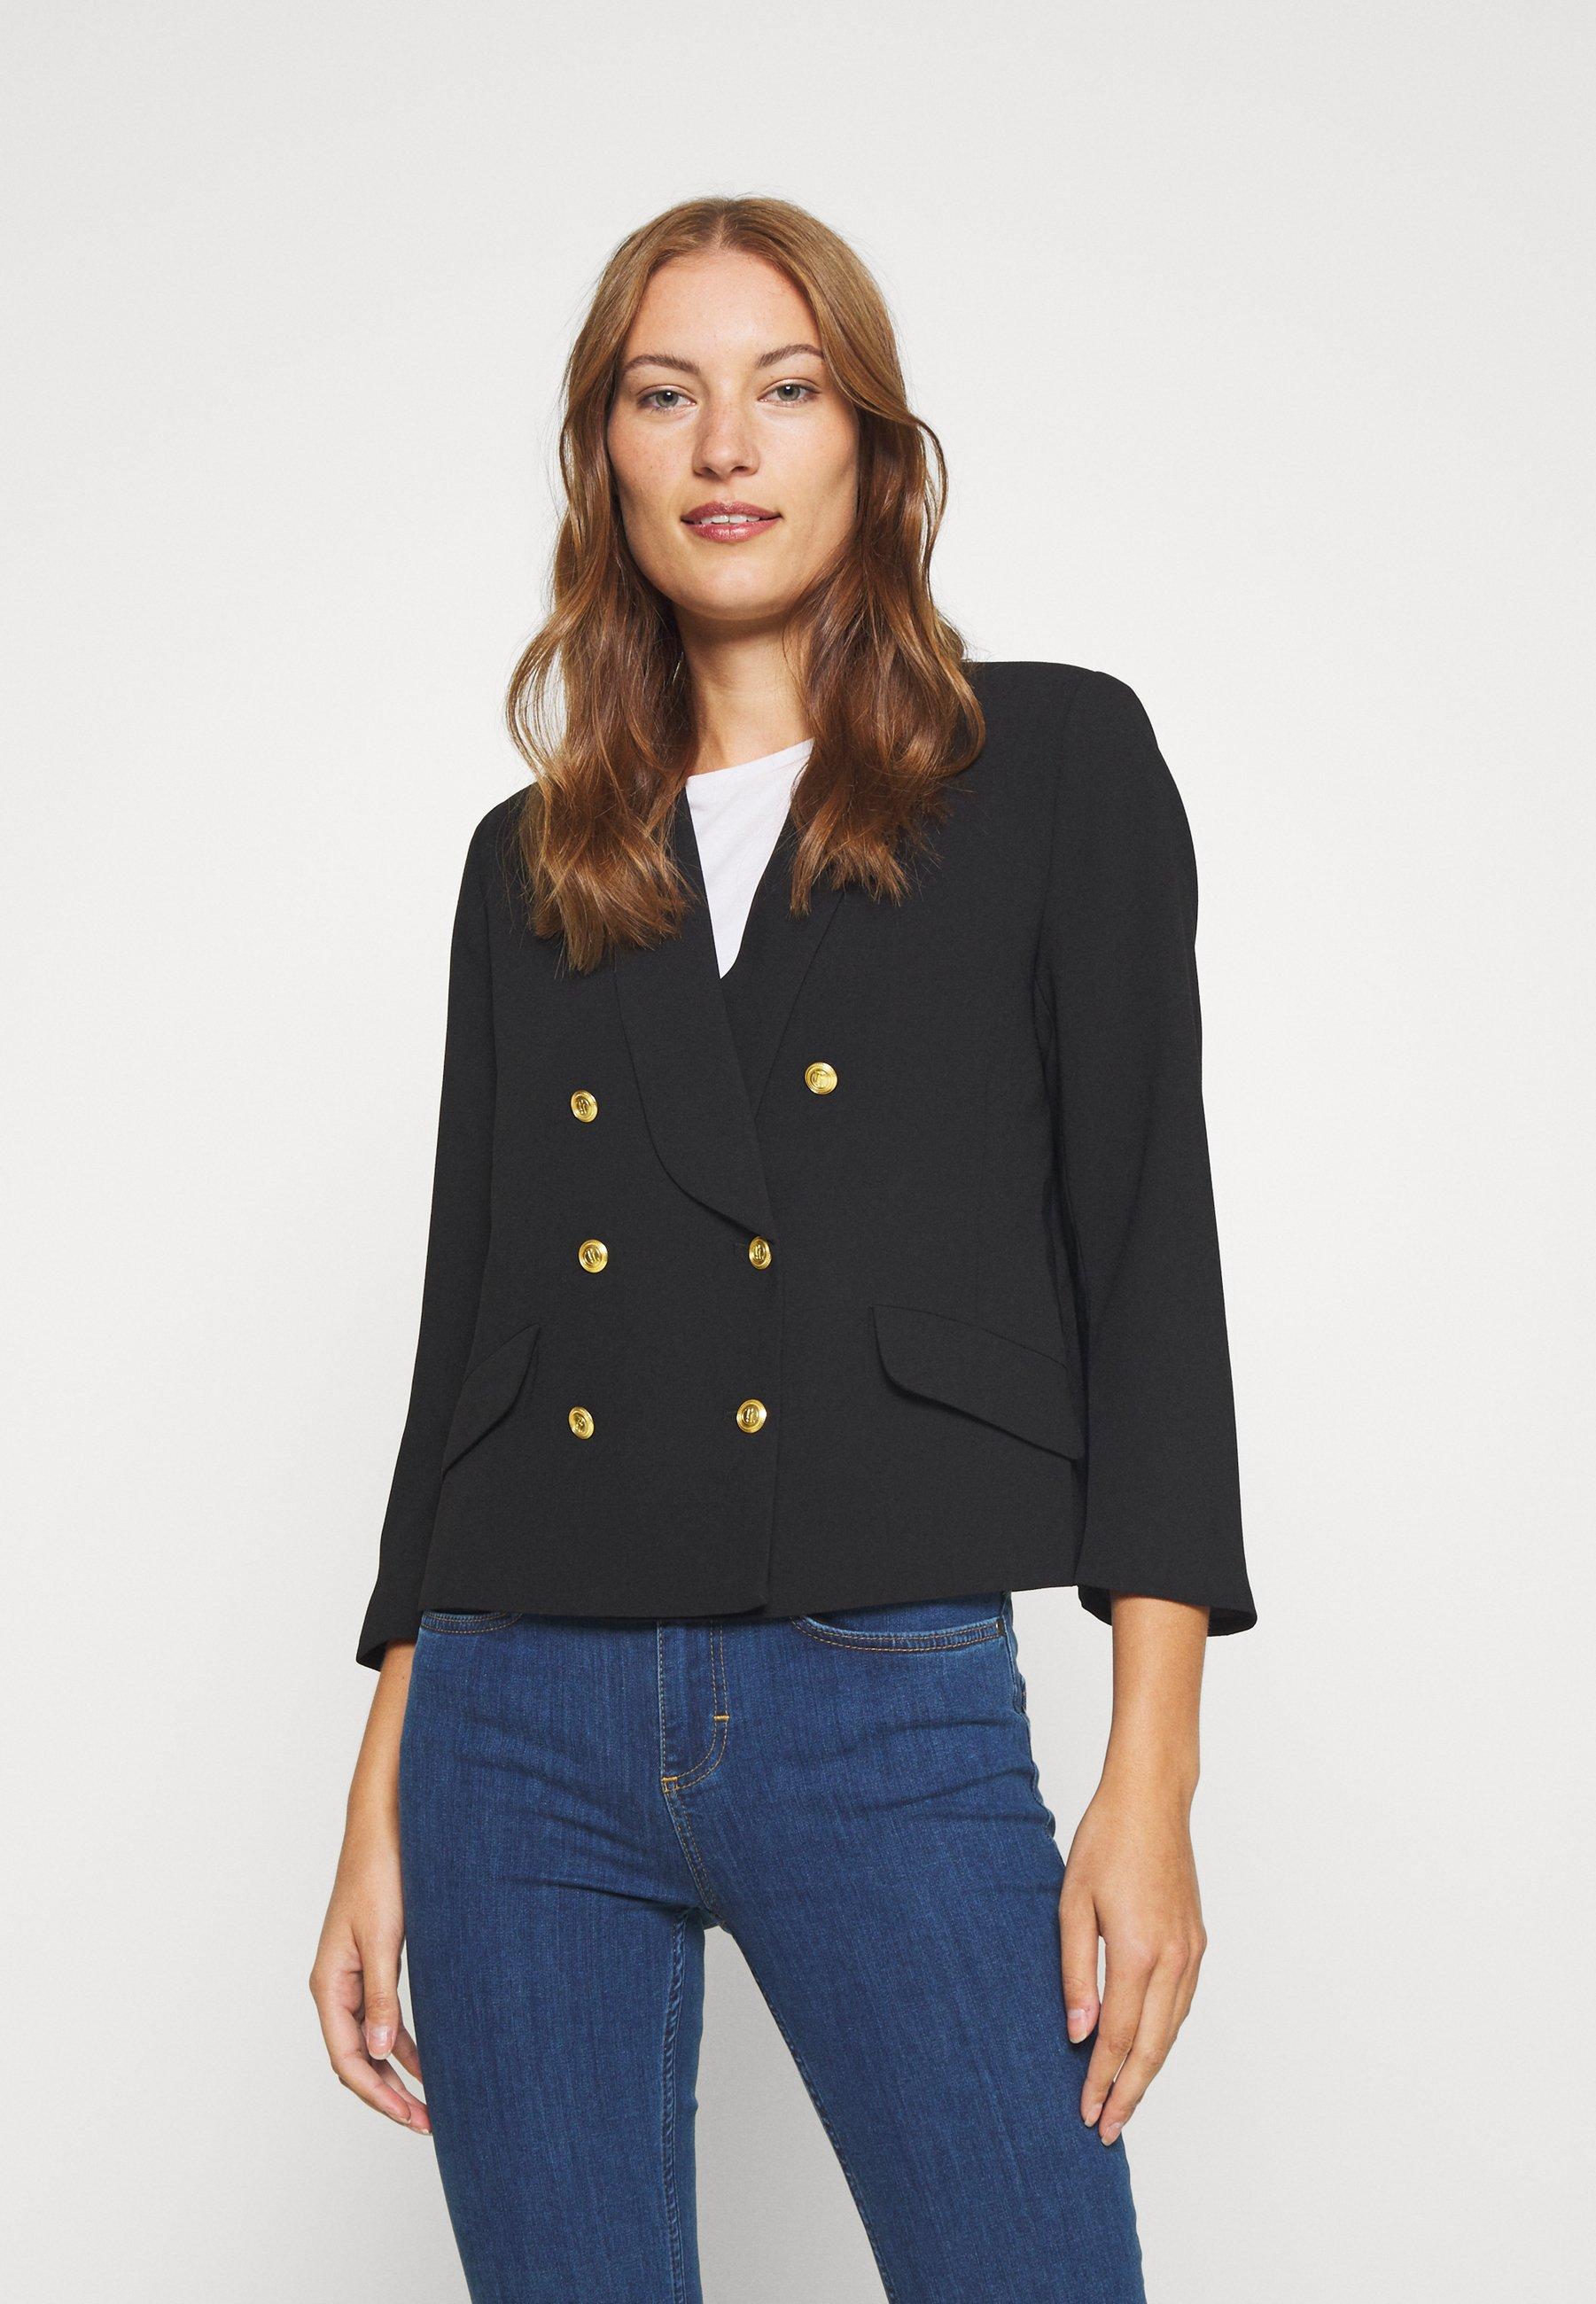 Twist & Tango DINA - Blazer - black   Damenbekleidung billig